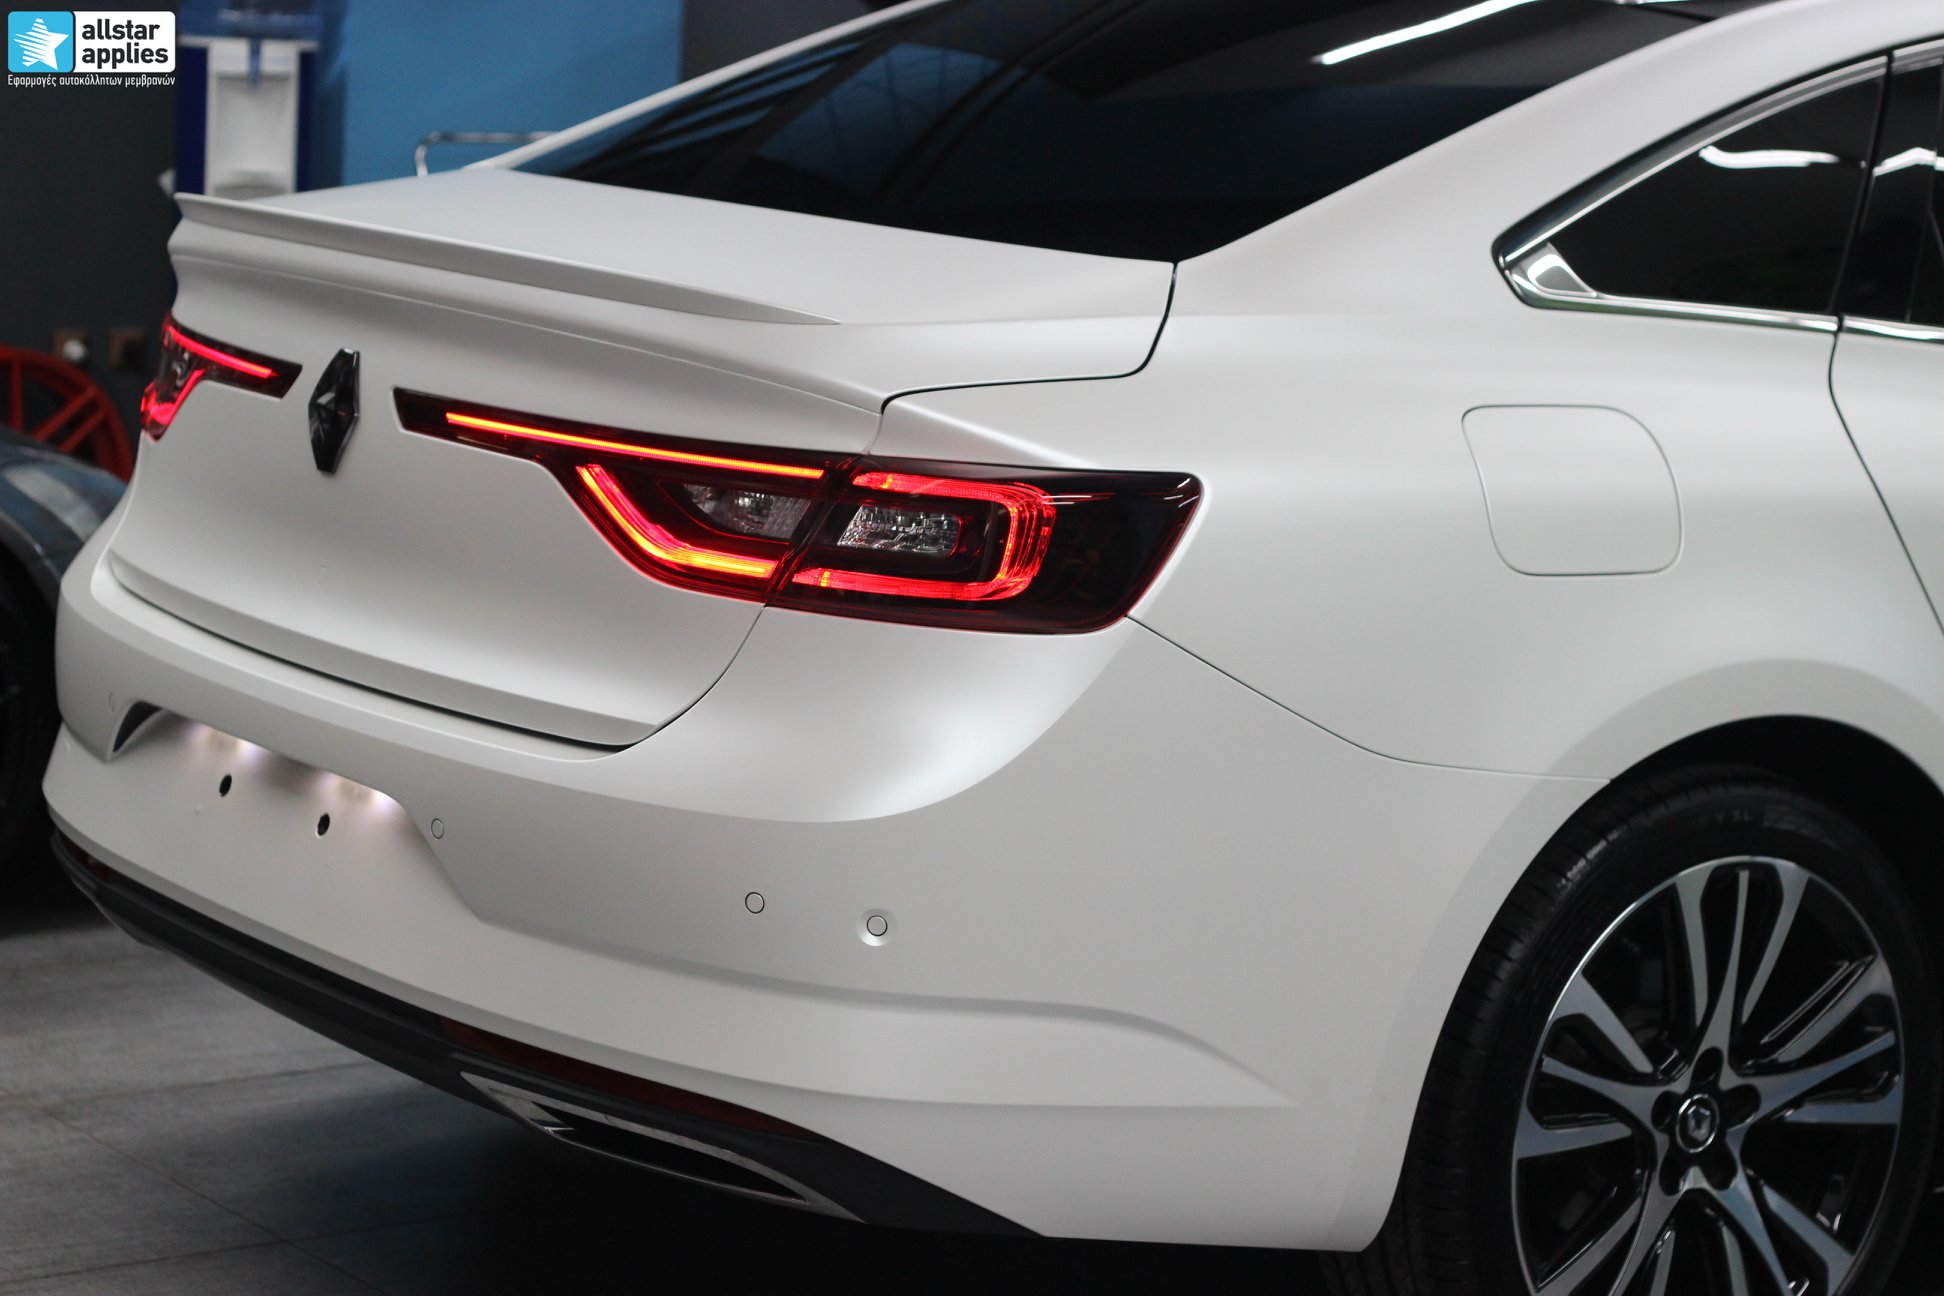 Renault Talisman - Satin Pearl White (9)